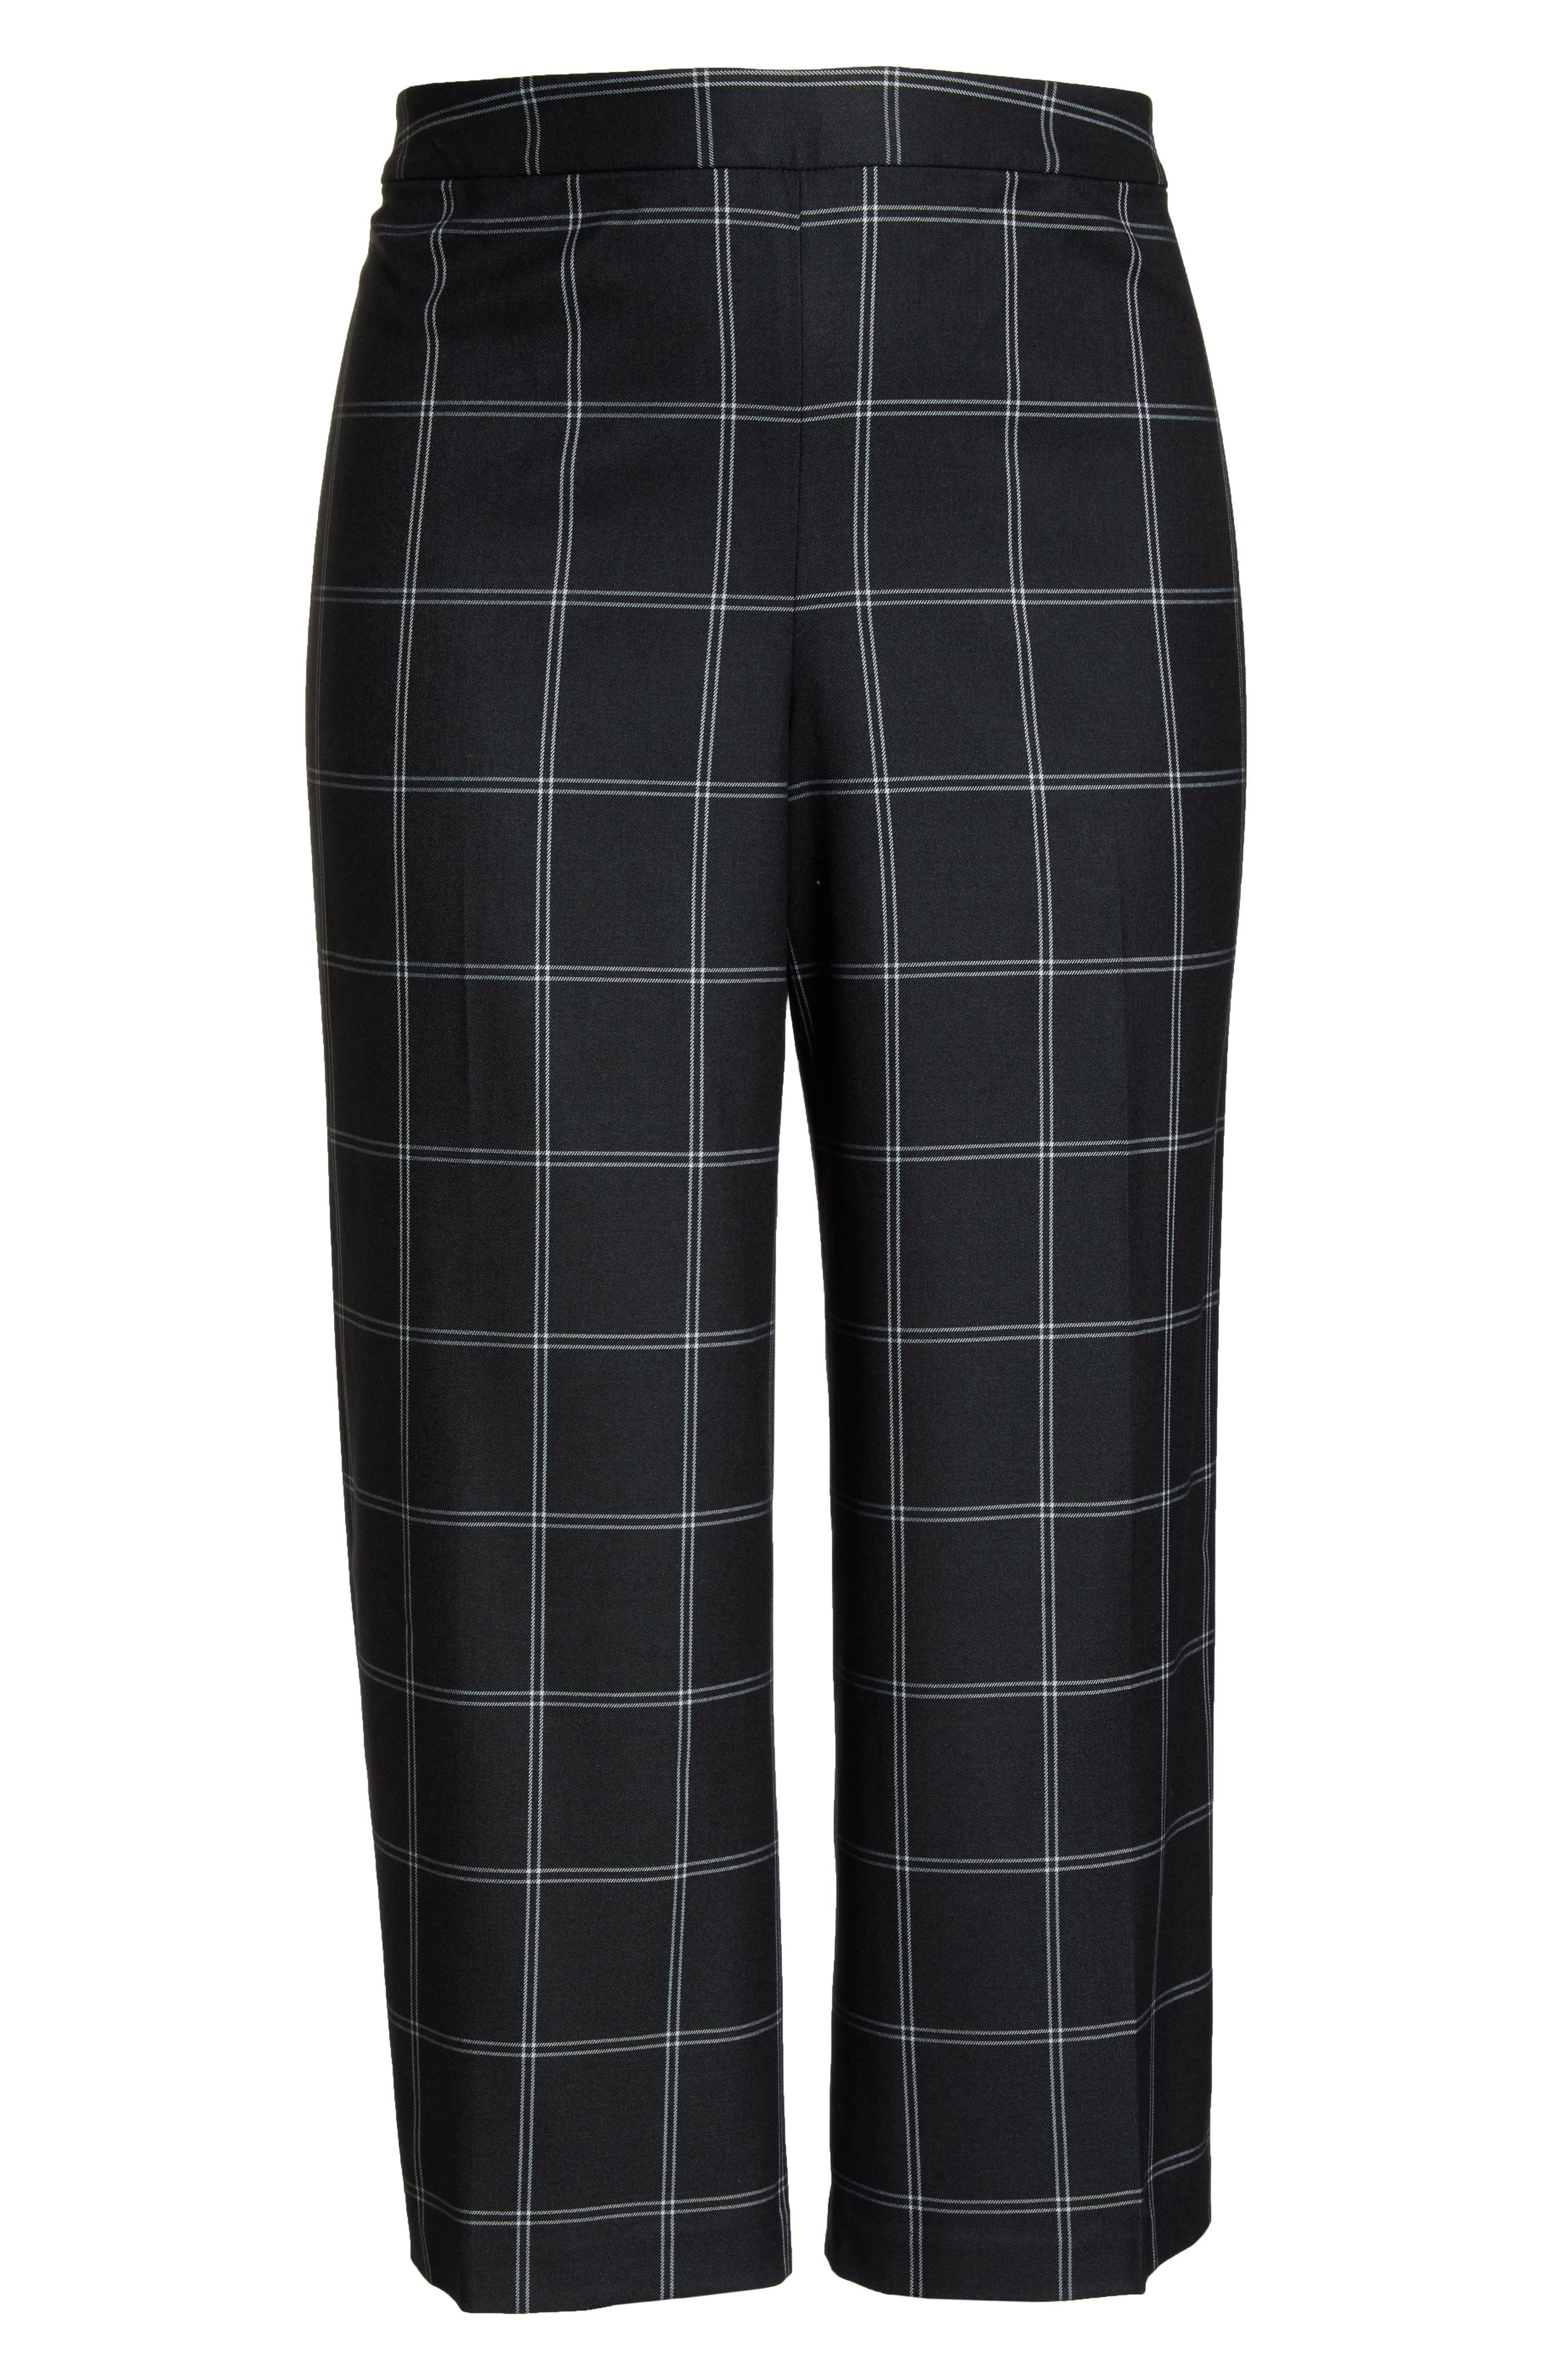 Windowpane Check Wide Leg Crop Pants,                             Alternate thumbnail 6, color,                             GREY TWILL PLAID